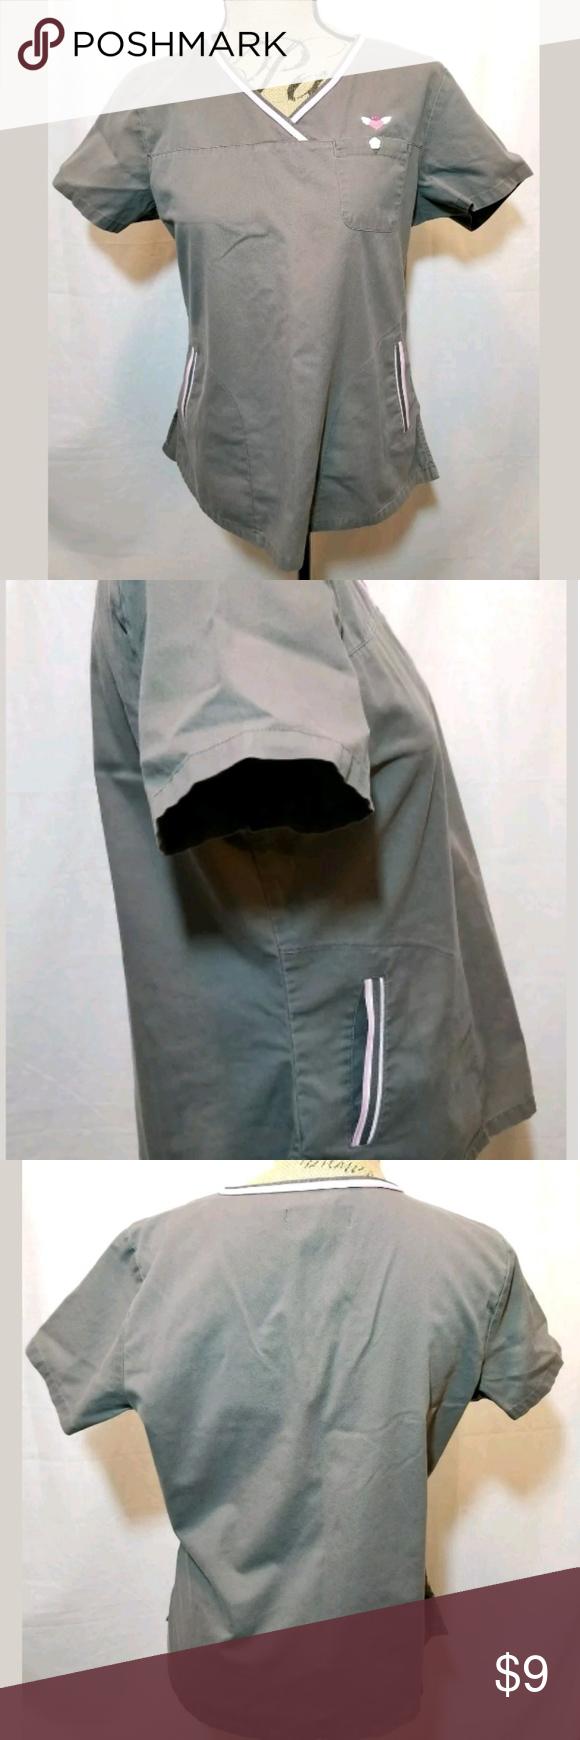 Mike S Koi Sleeve Chest Panel Unfinished Big Jpg 2400 3200: Koi Scrub Gray Shirt Sleeve Top Small Koi By Kathy